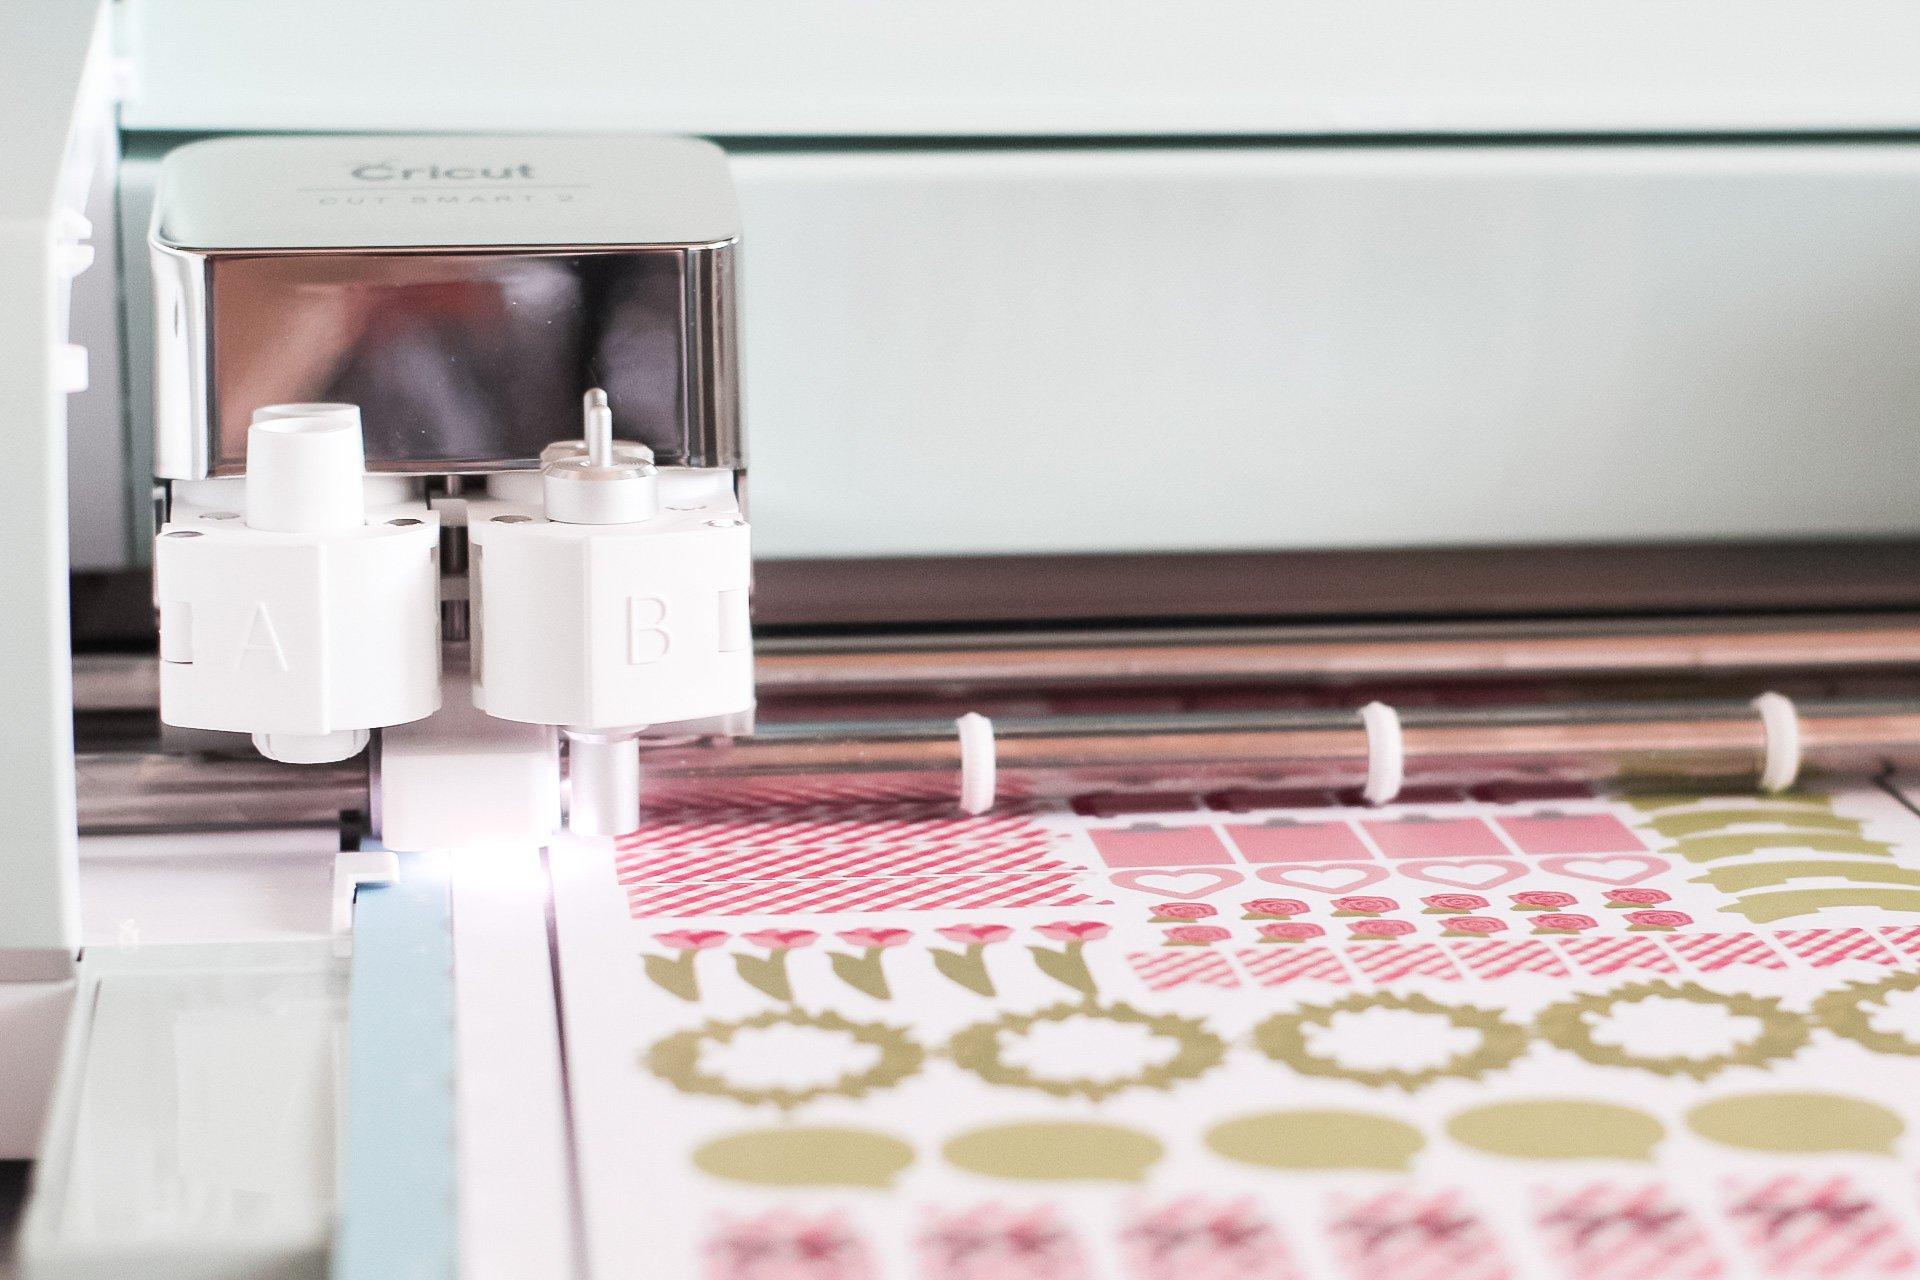 cricut calibration for print then cut stickers